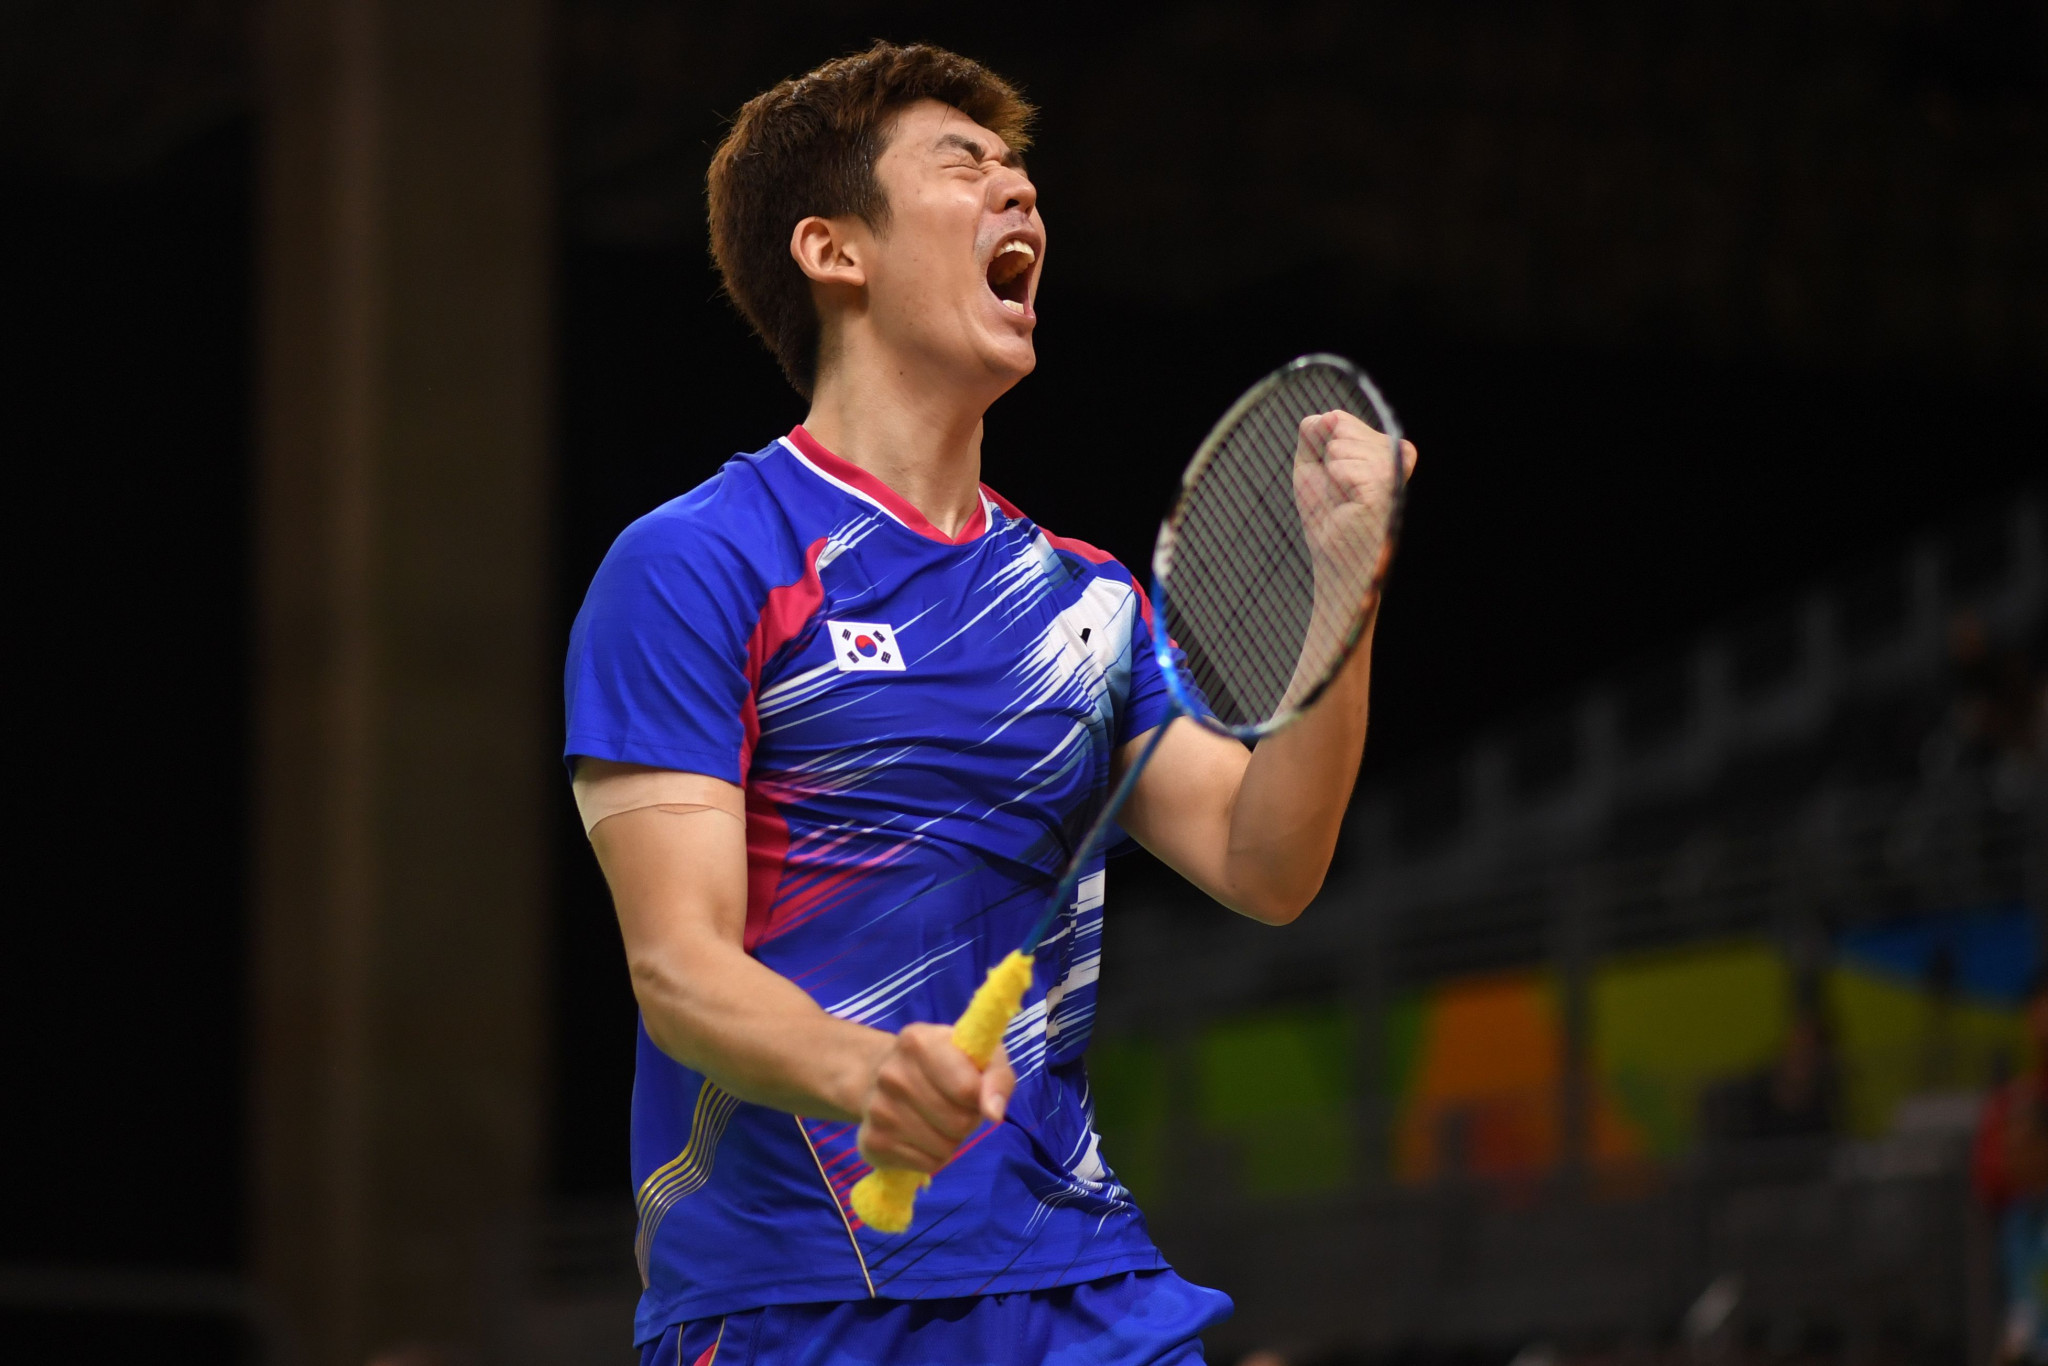 Olympic badminton gold medallist Lee tests positive for coronavirus